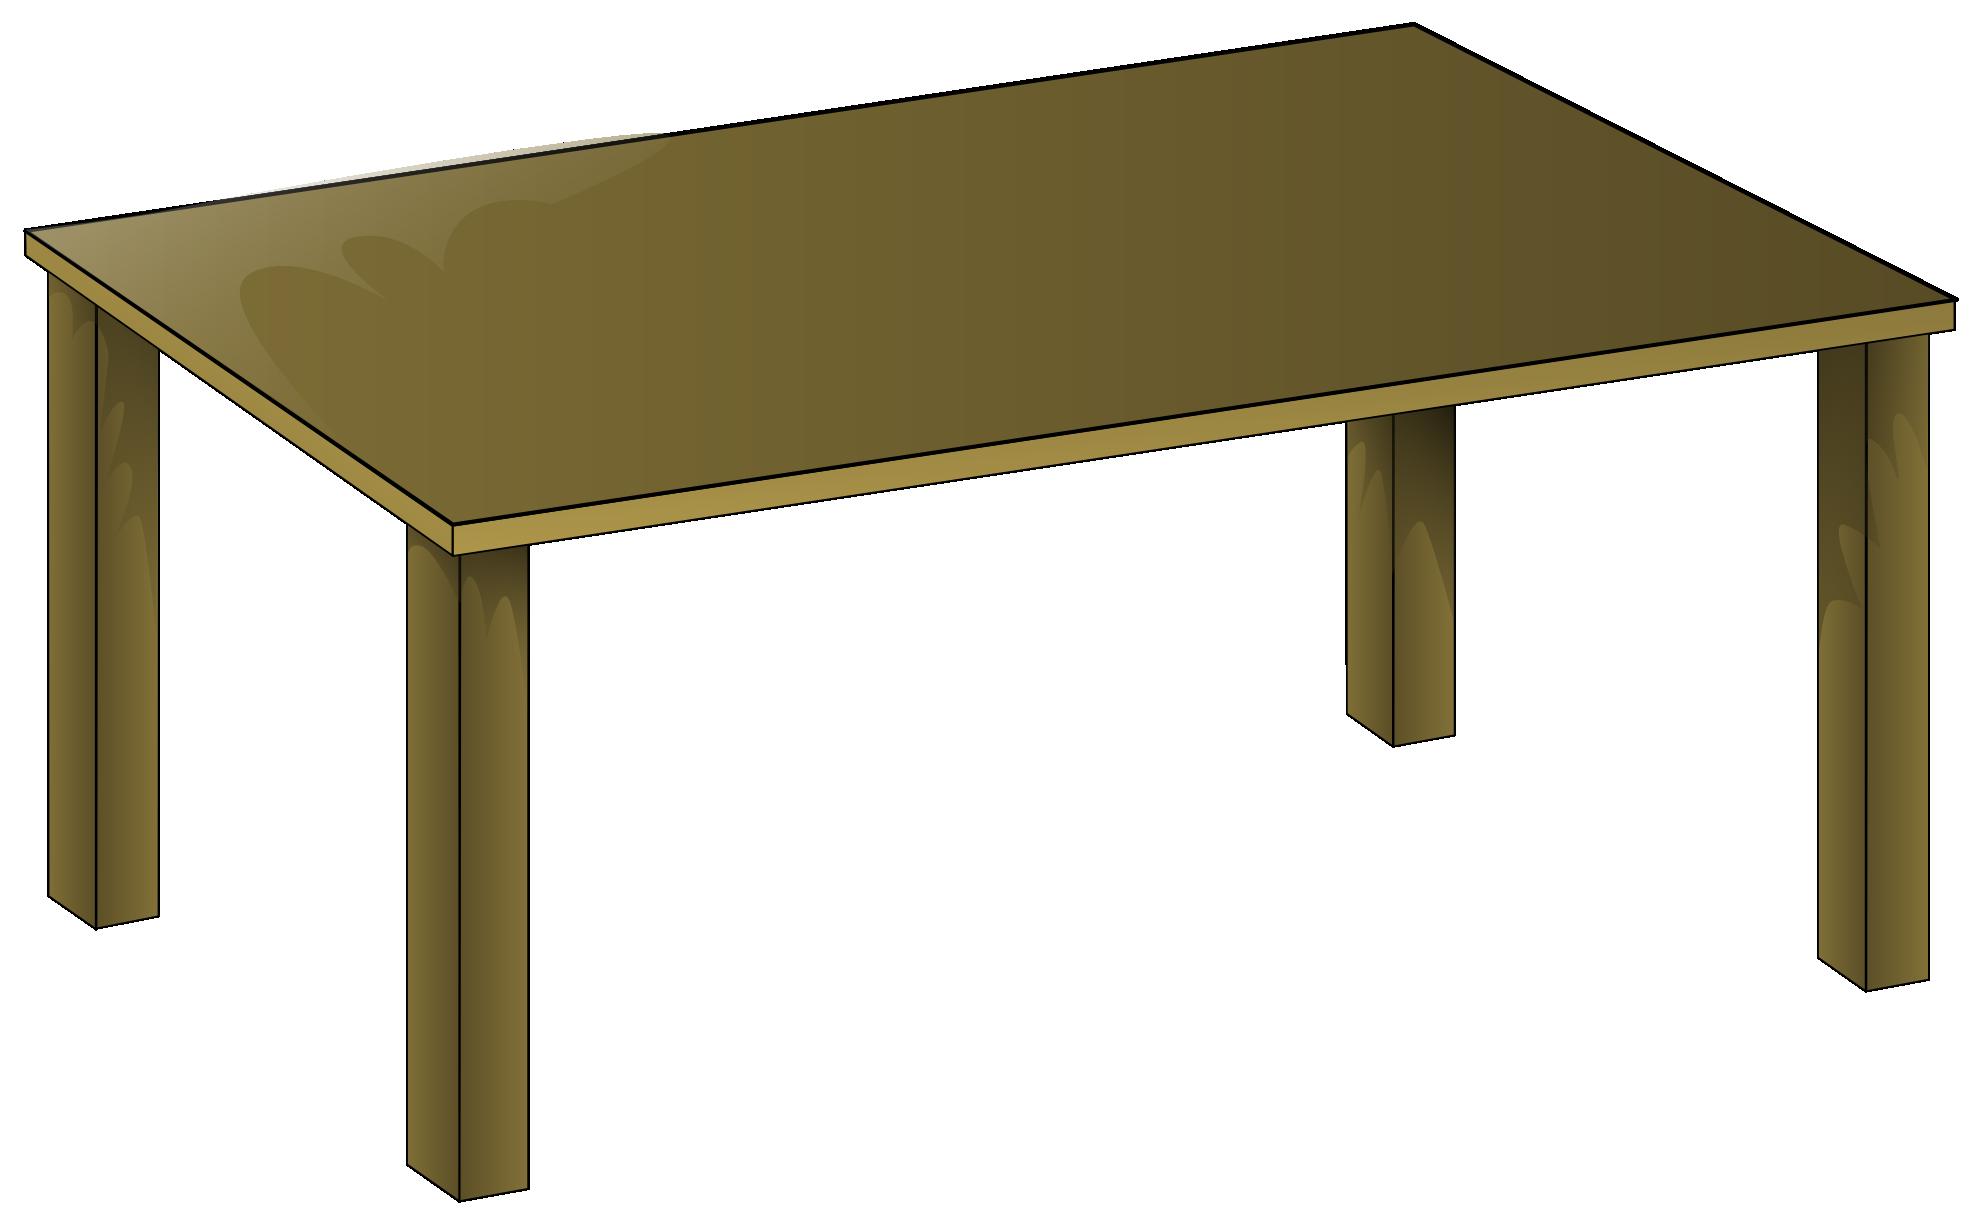 1979x1224 Dinner Table Clip Art 225938